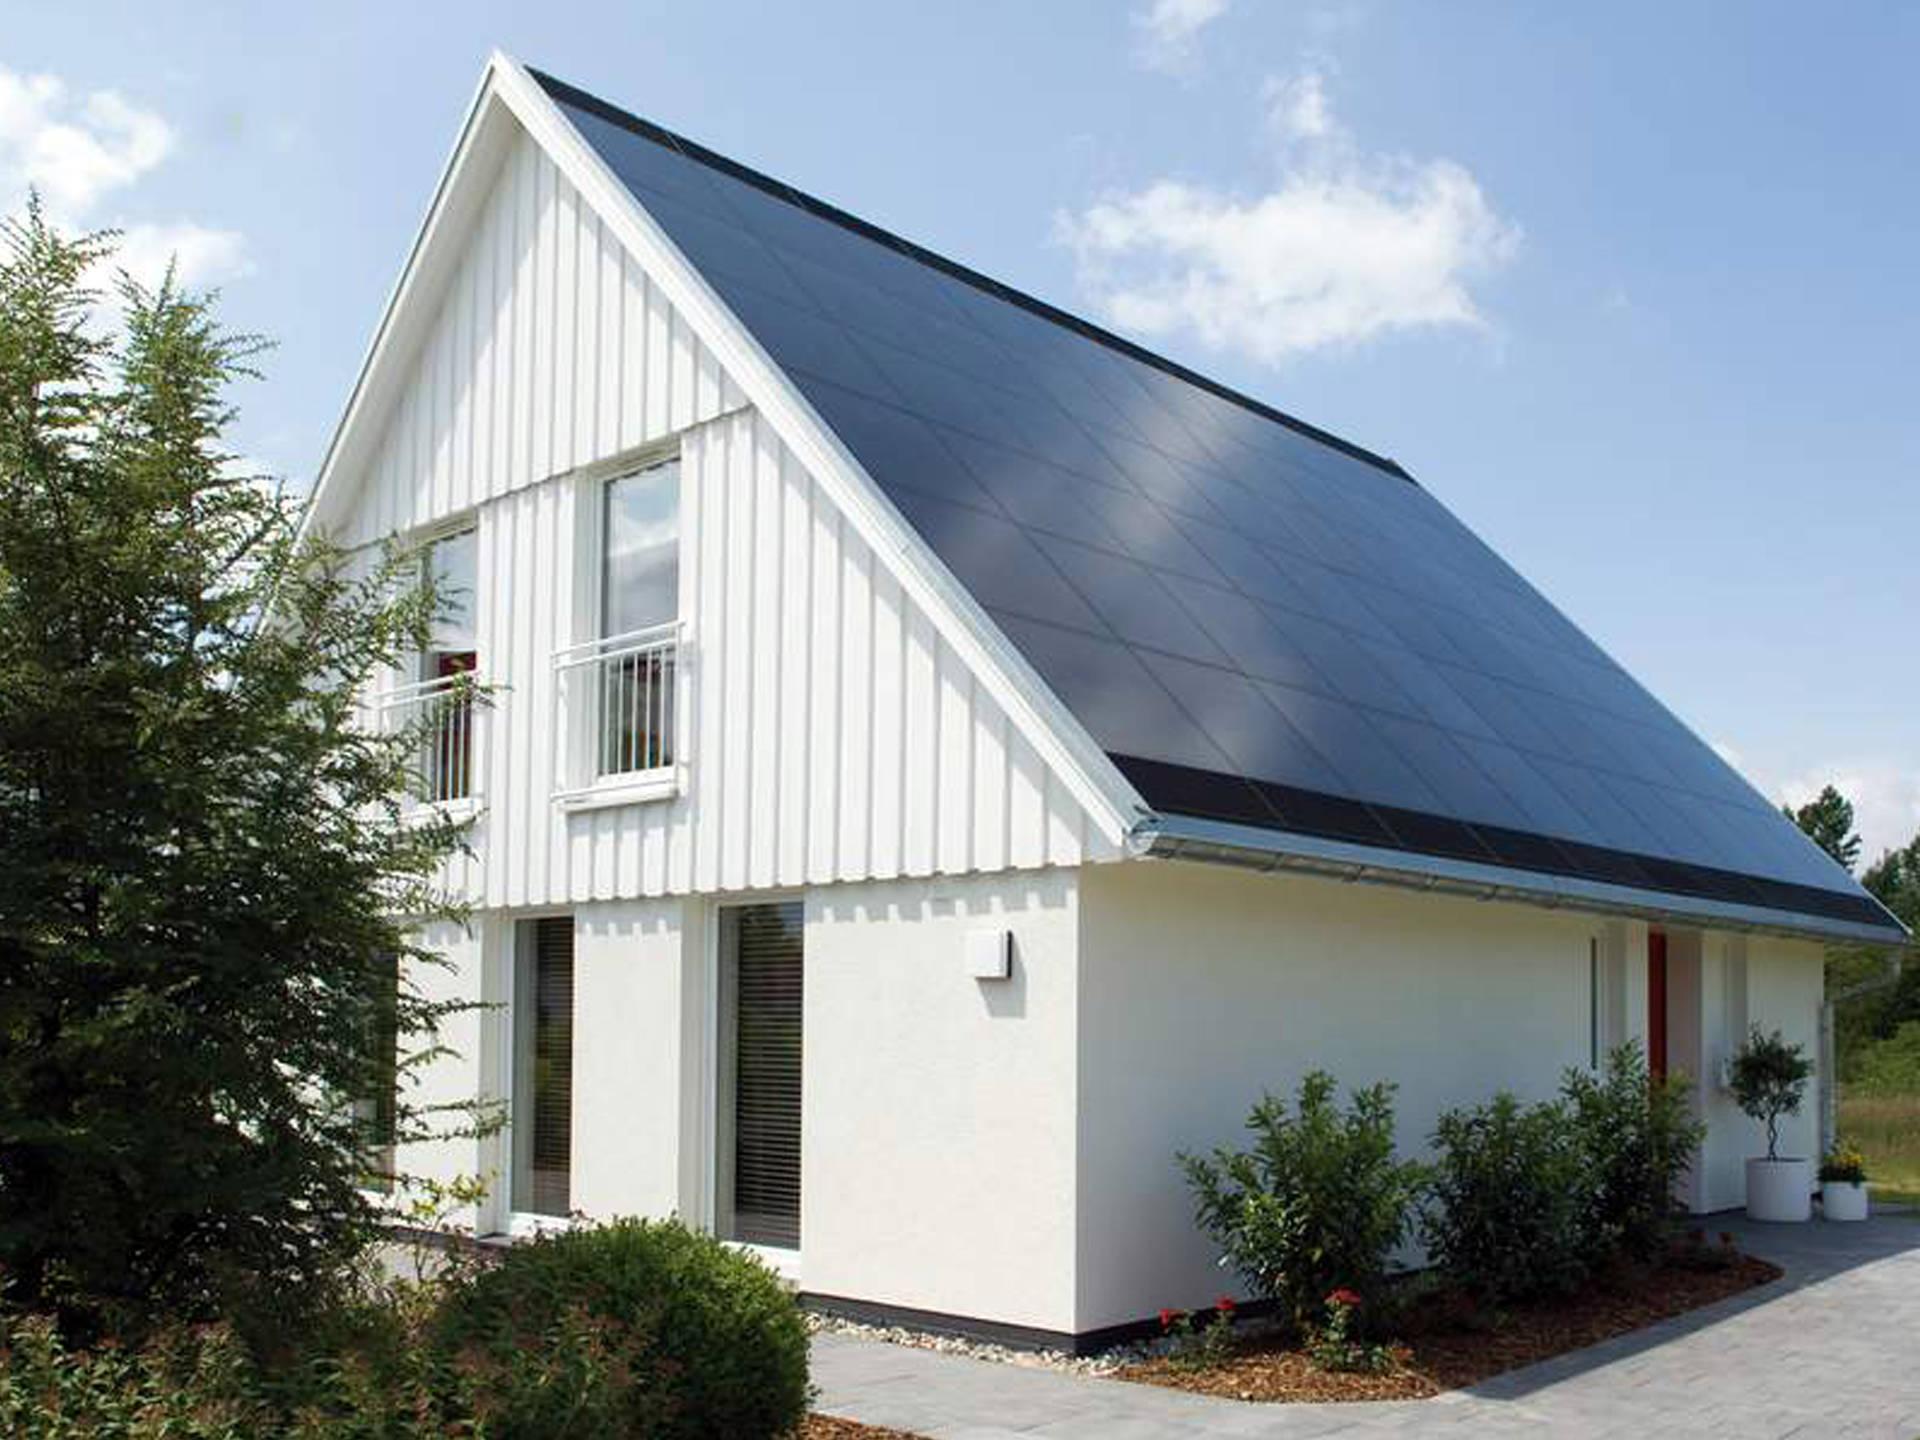 Classico 300 - Viebrockhaus